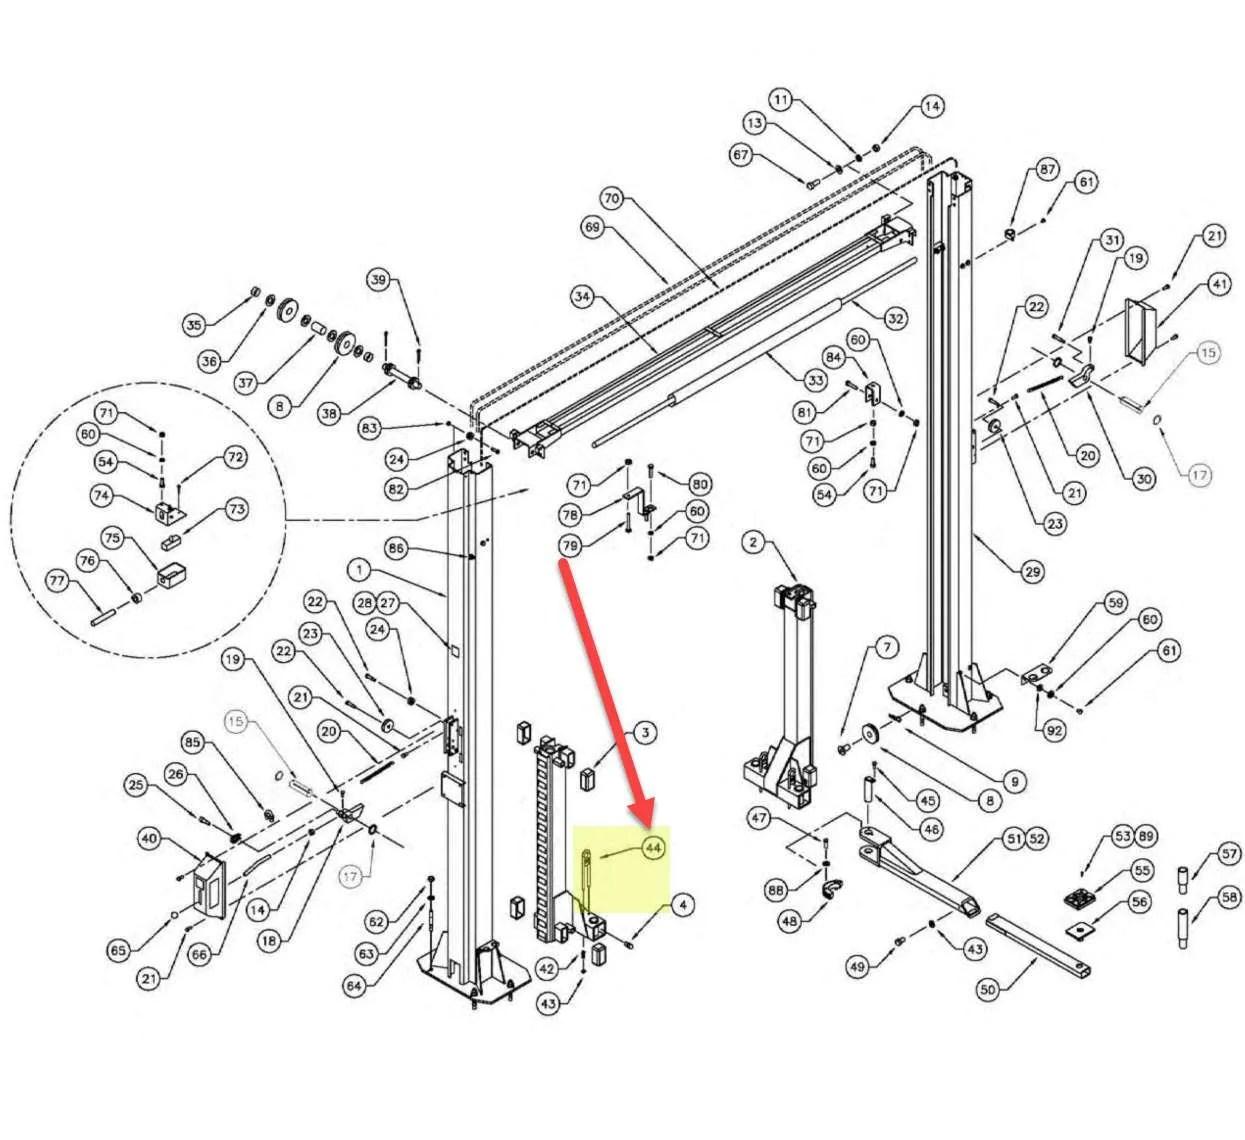 WHEELTRONIC 2 POST ARM RESTRAINT OEM# 2-2940 or 1-2914